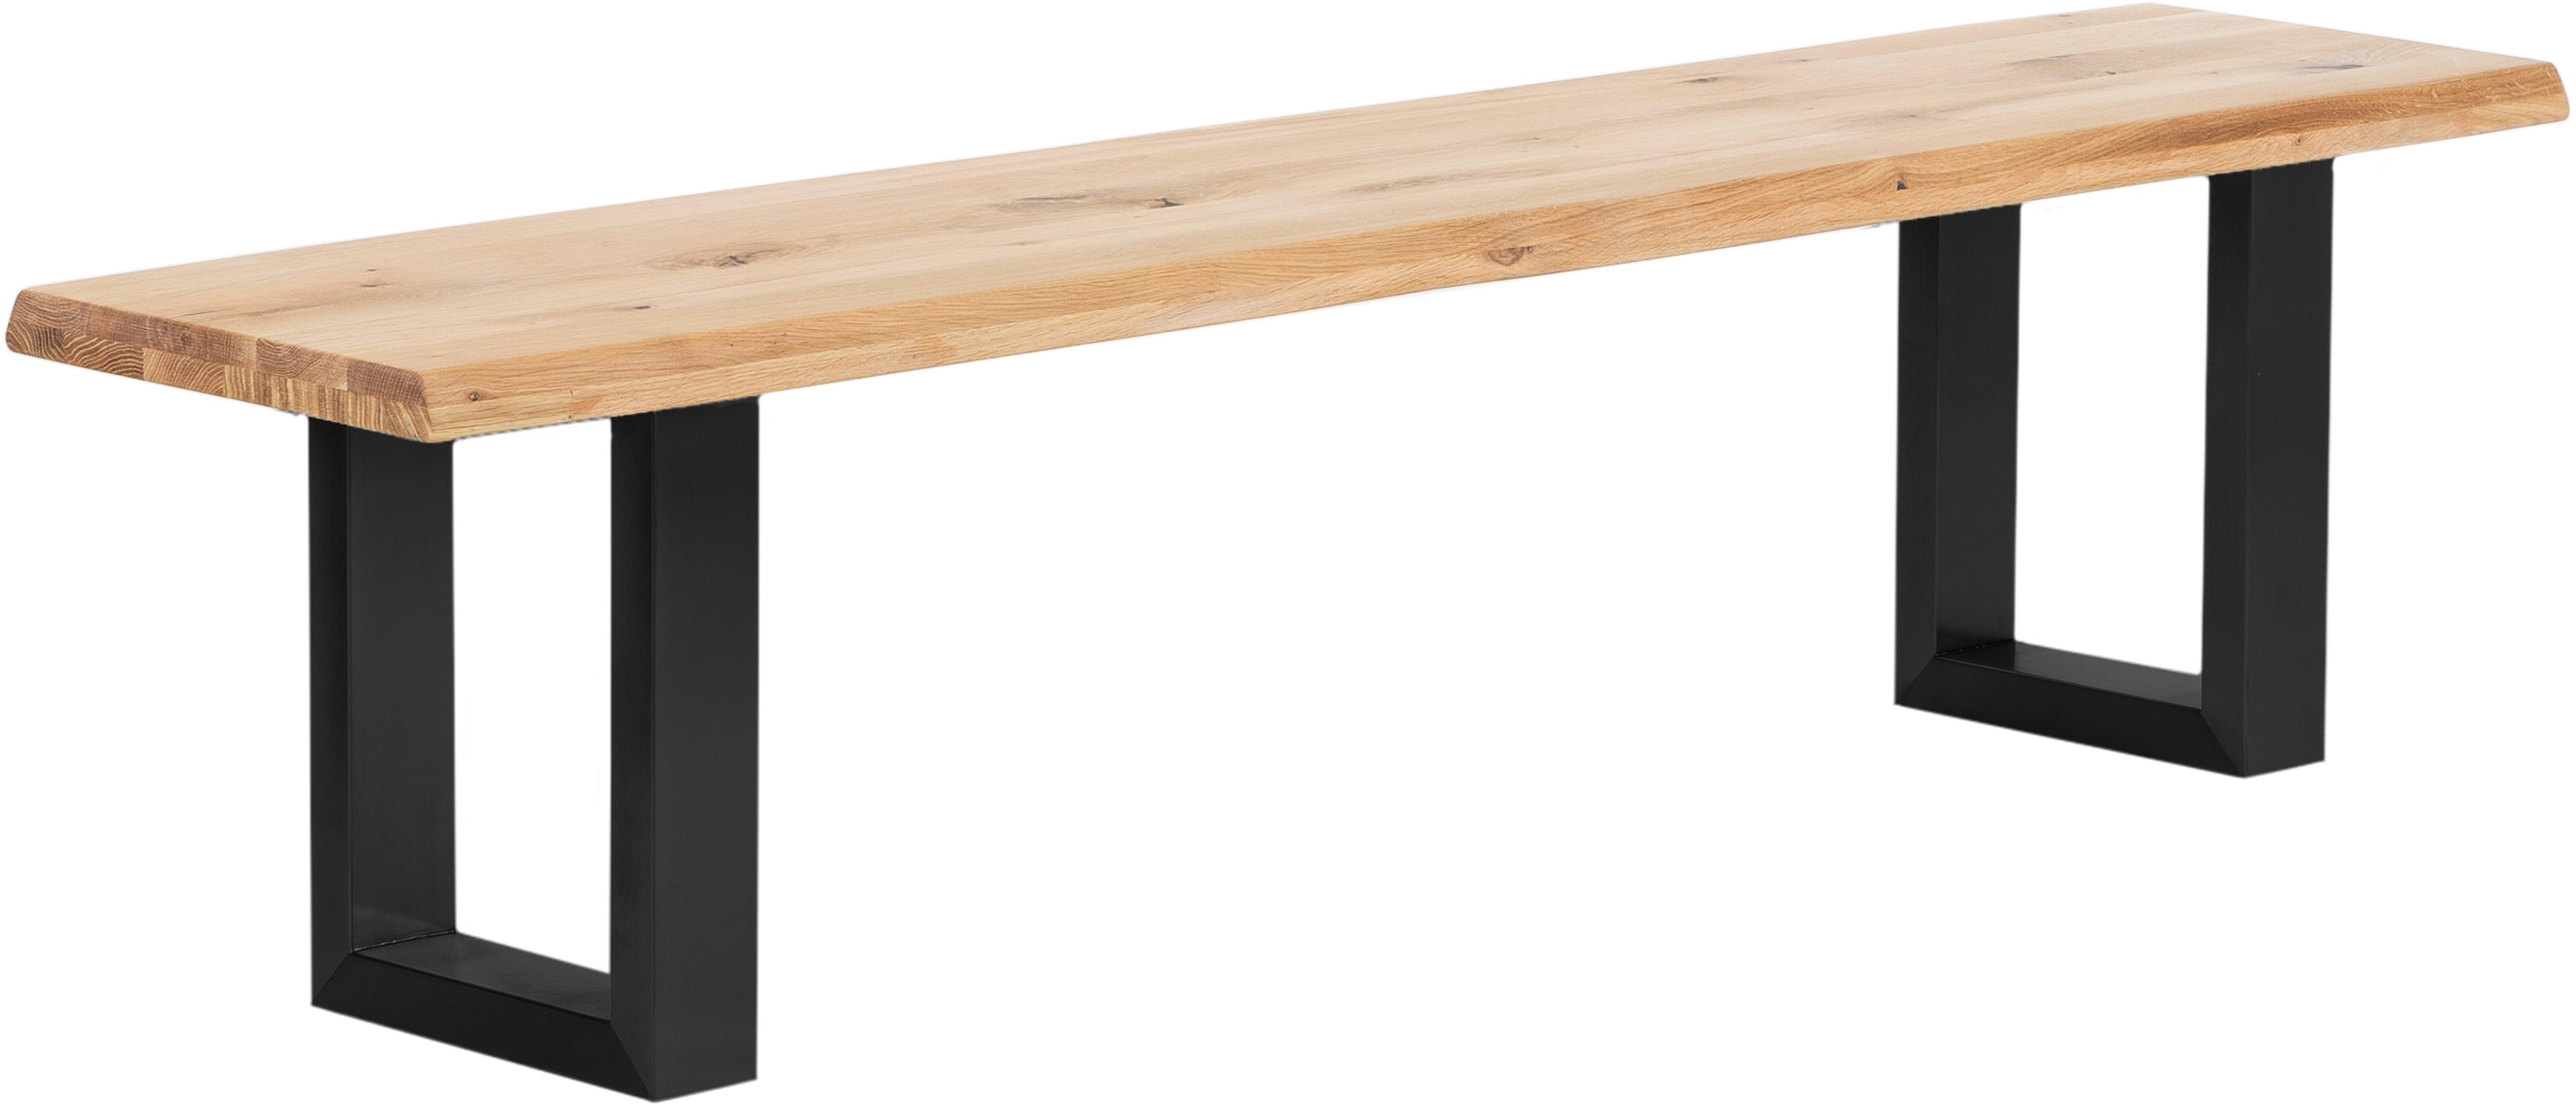 Banco de madera maciza Oliver, Asiento: madera de roble silvestre, Patas: acero mate lacado, Roble, negro, An 180 x Al 45 cm